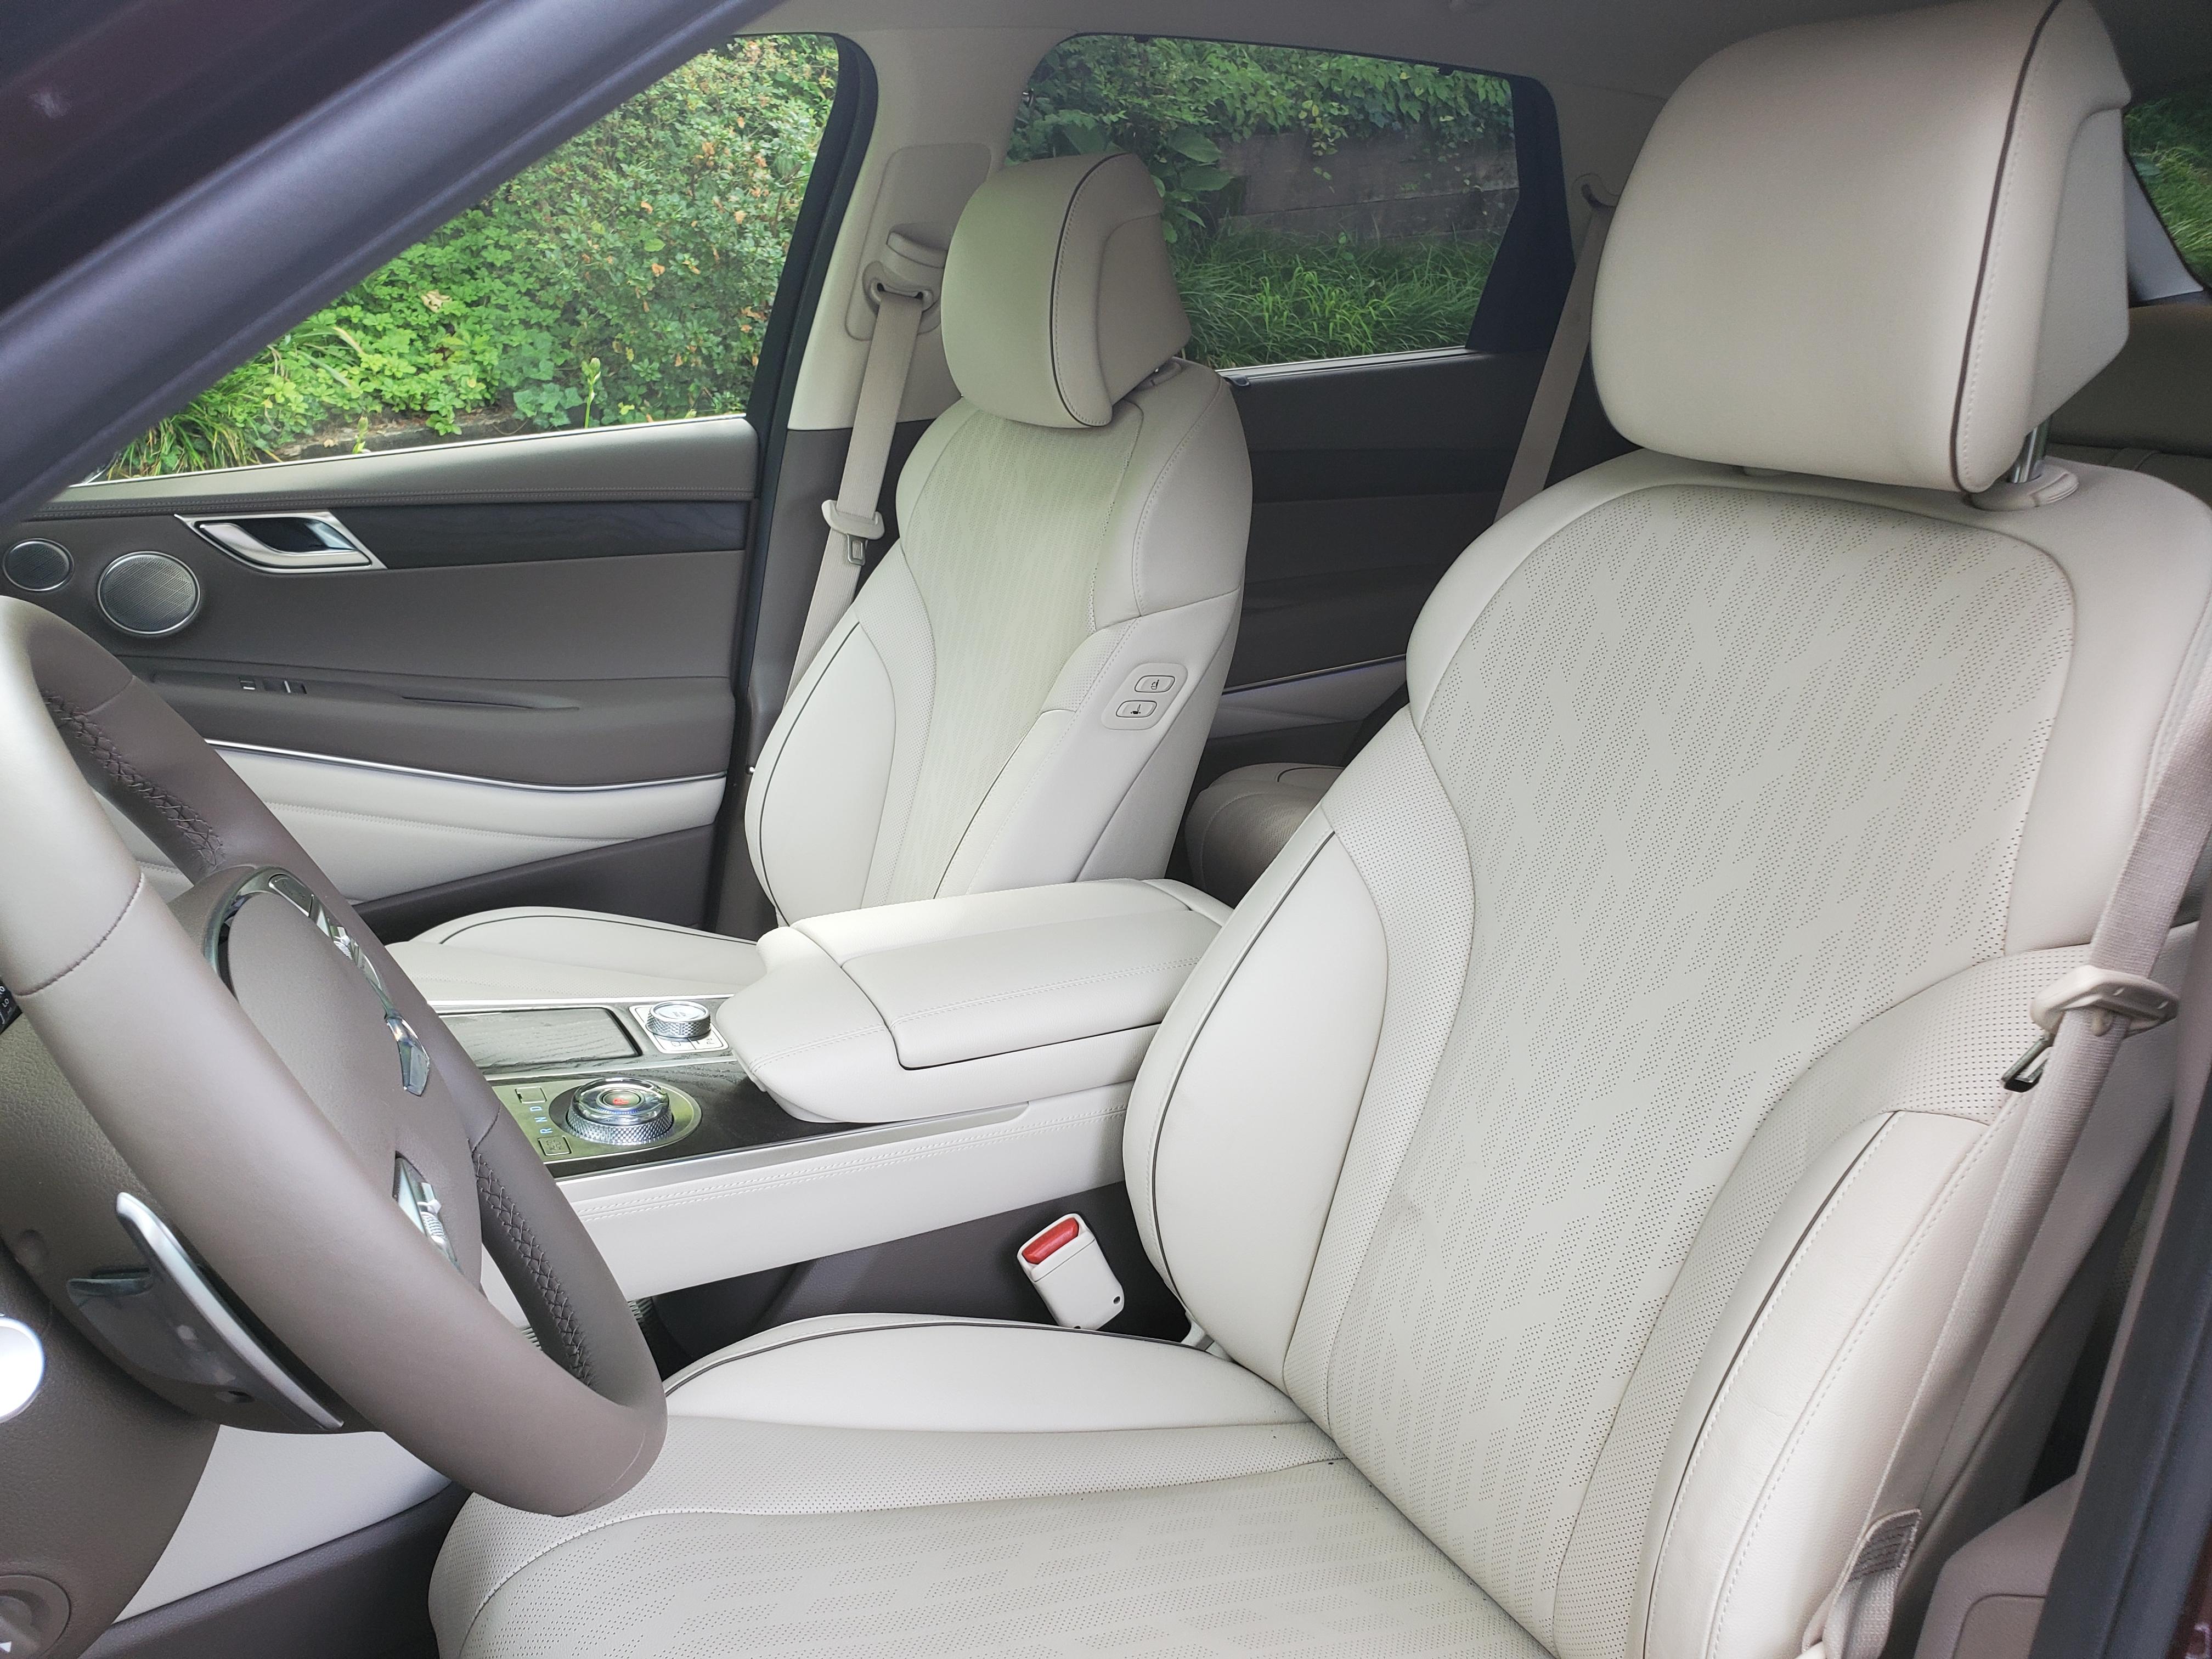 Genesis GV80 front seats